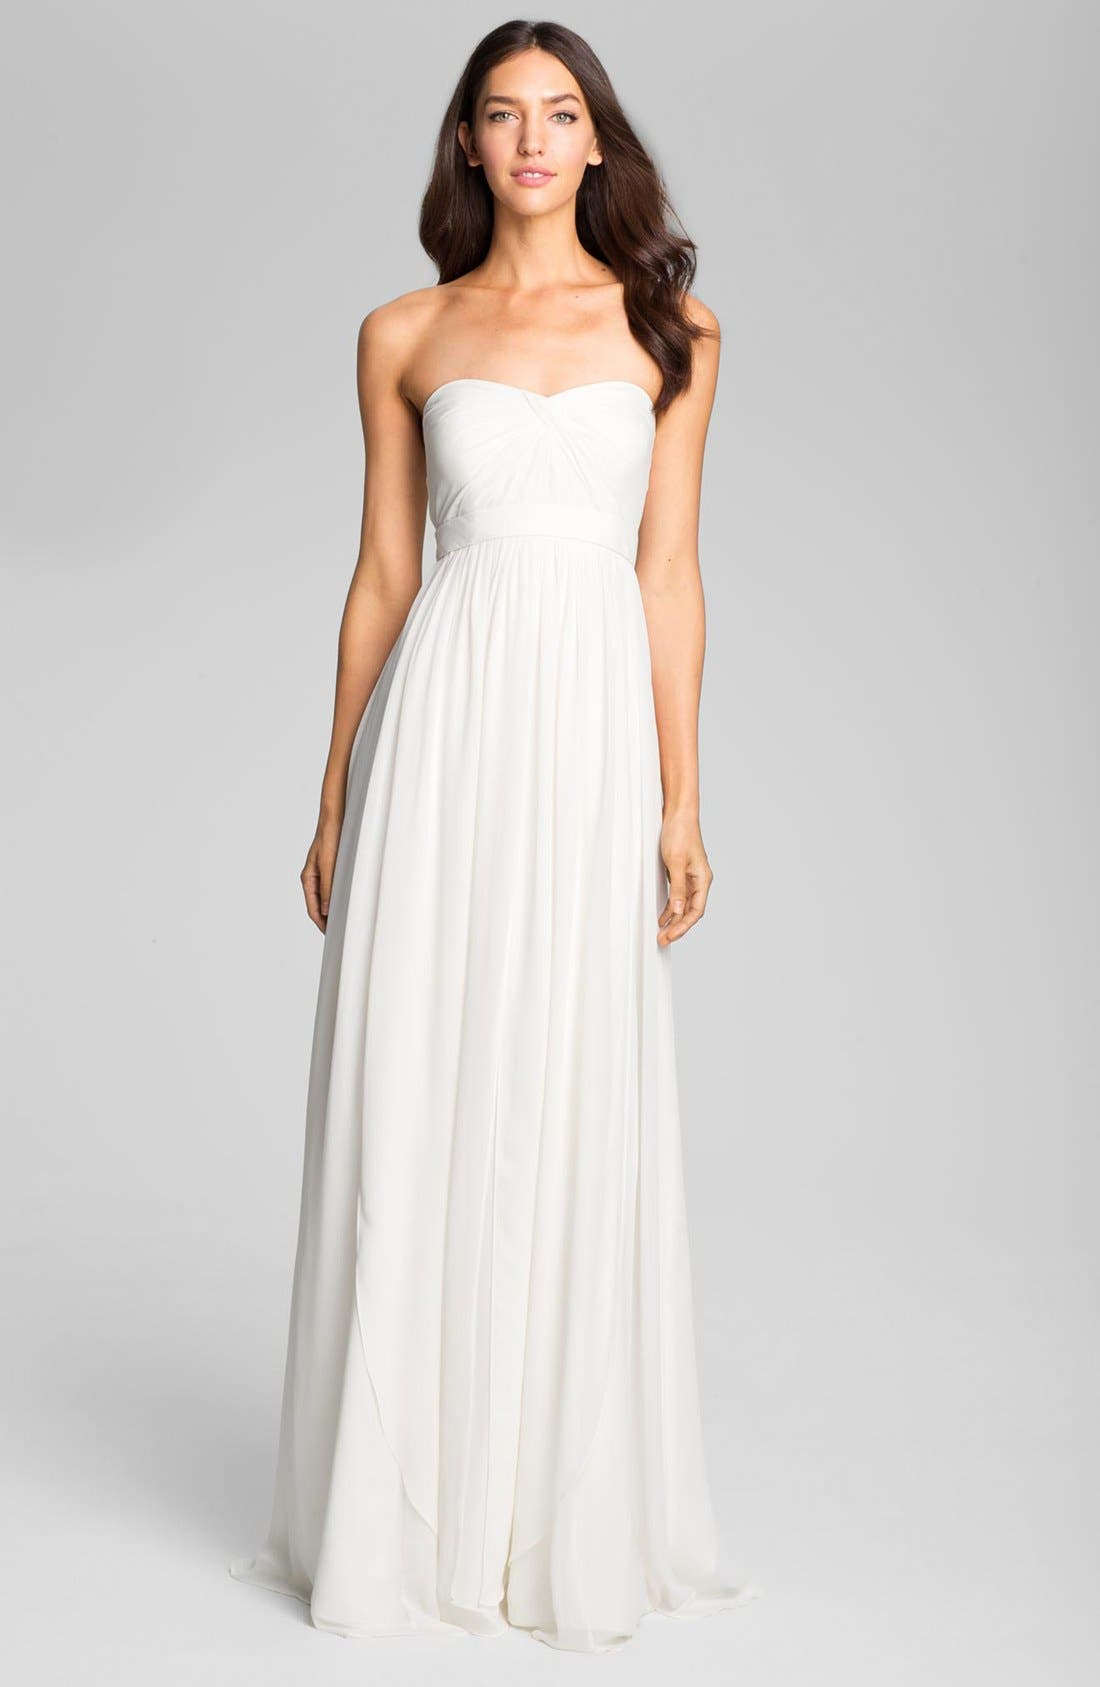 Main Image - Jenny Yoo 'Monarch' Sweetheart Neckline Layered Chiffon Gown